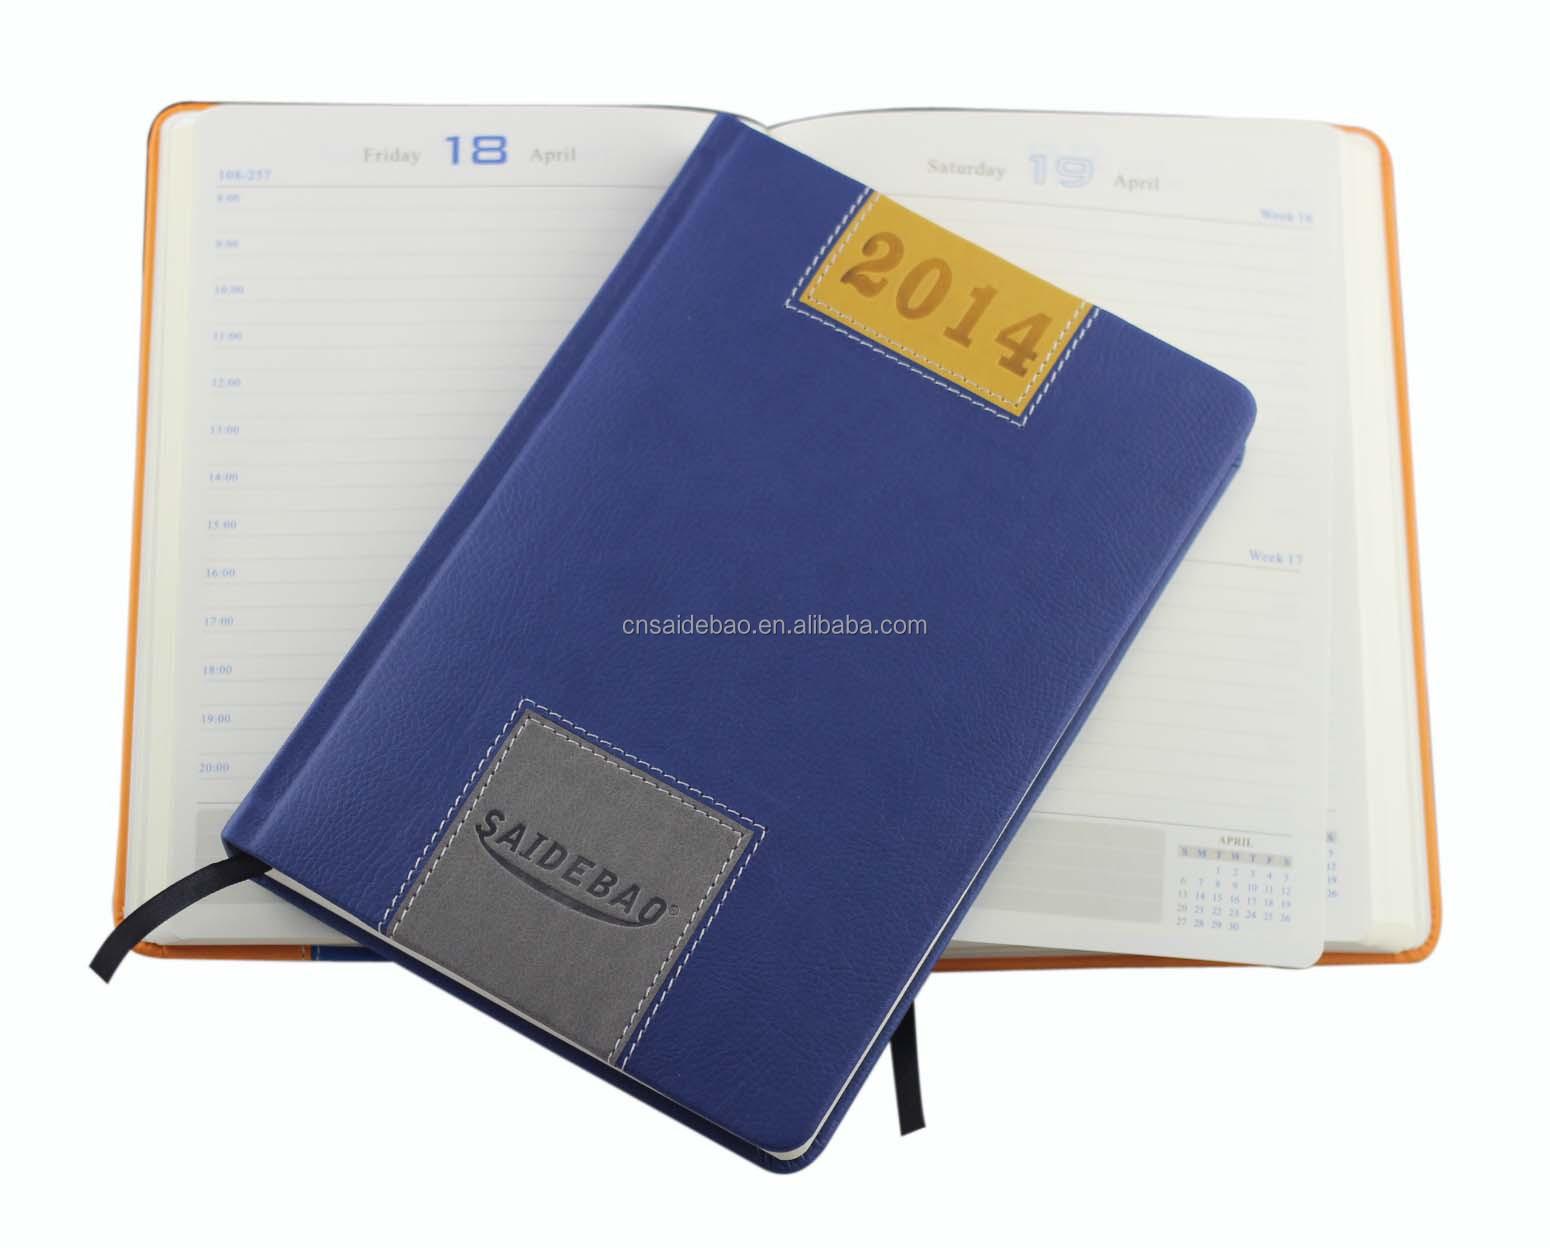 Calendar Notebook 2015 : Pu leather cover calendar notebook buy new style